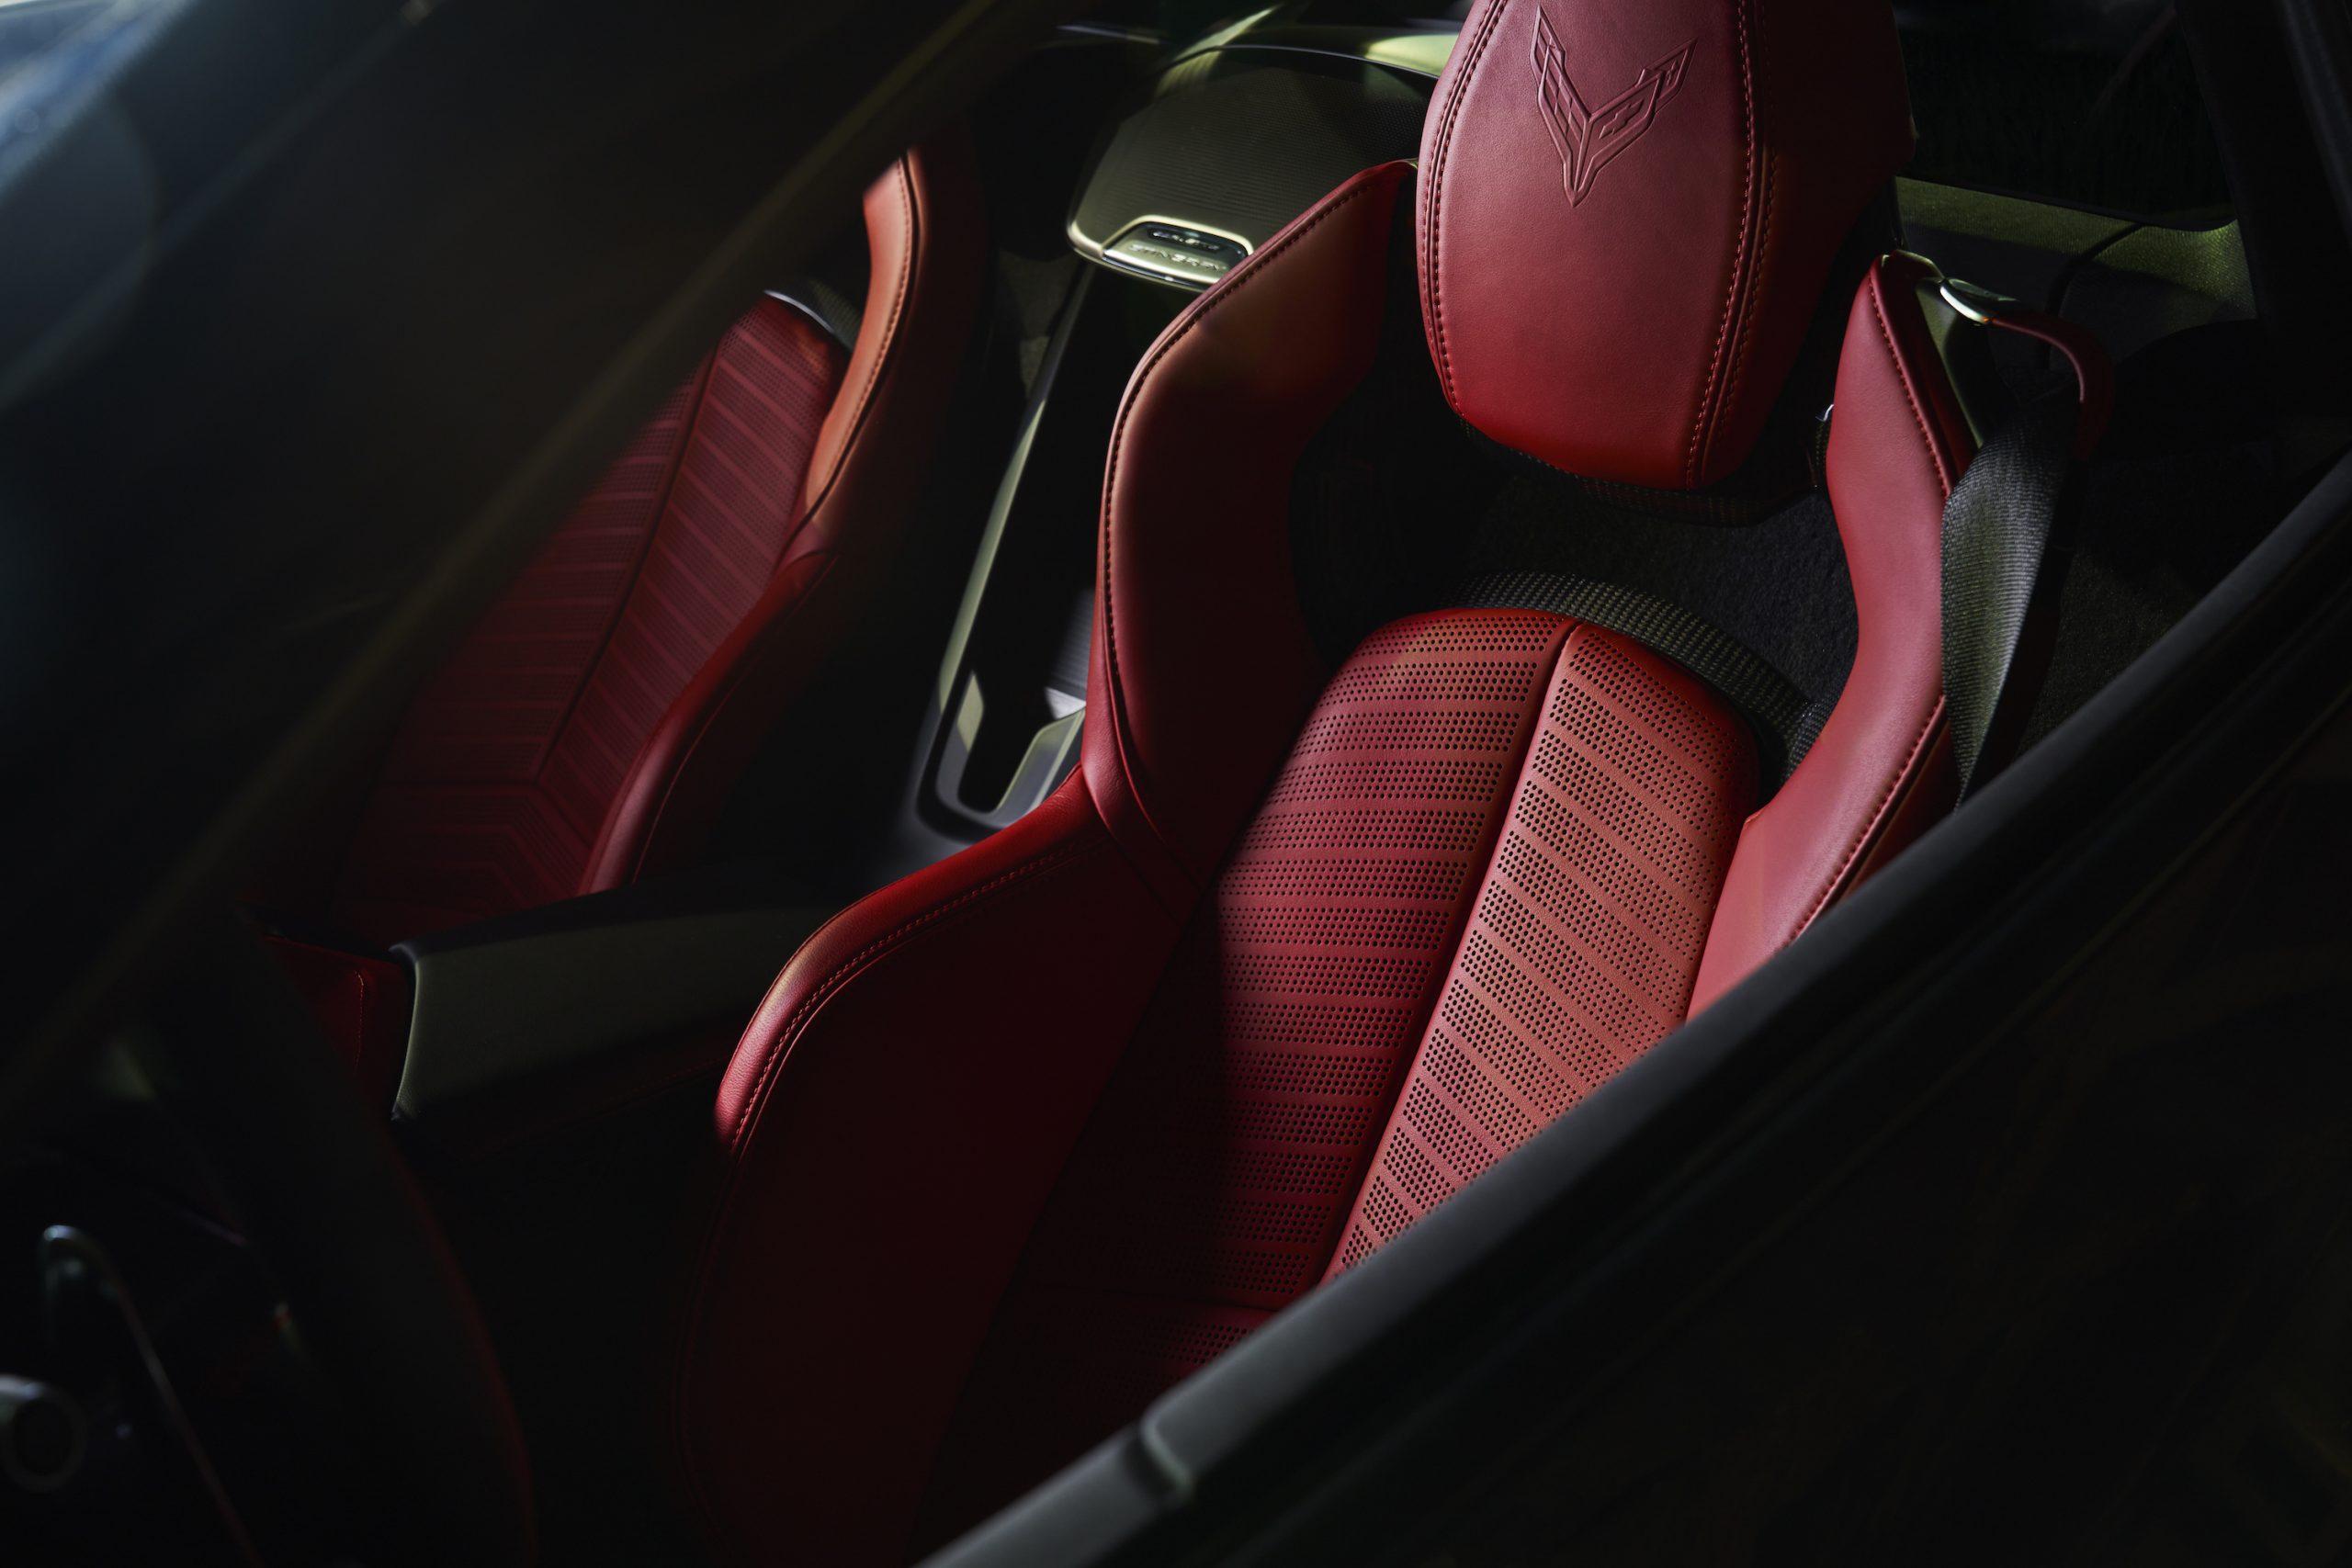 2020 Chevrolet Corvette Stingray 2LT C8 Interior Red Seats